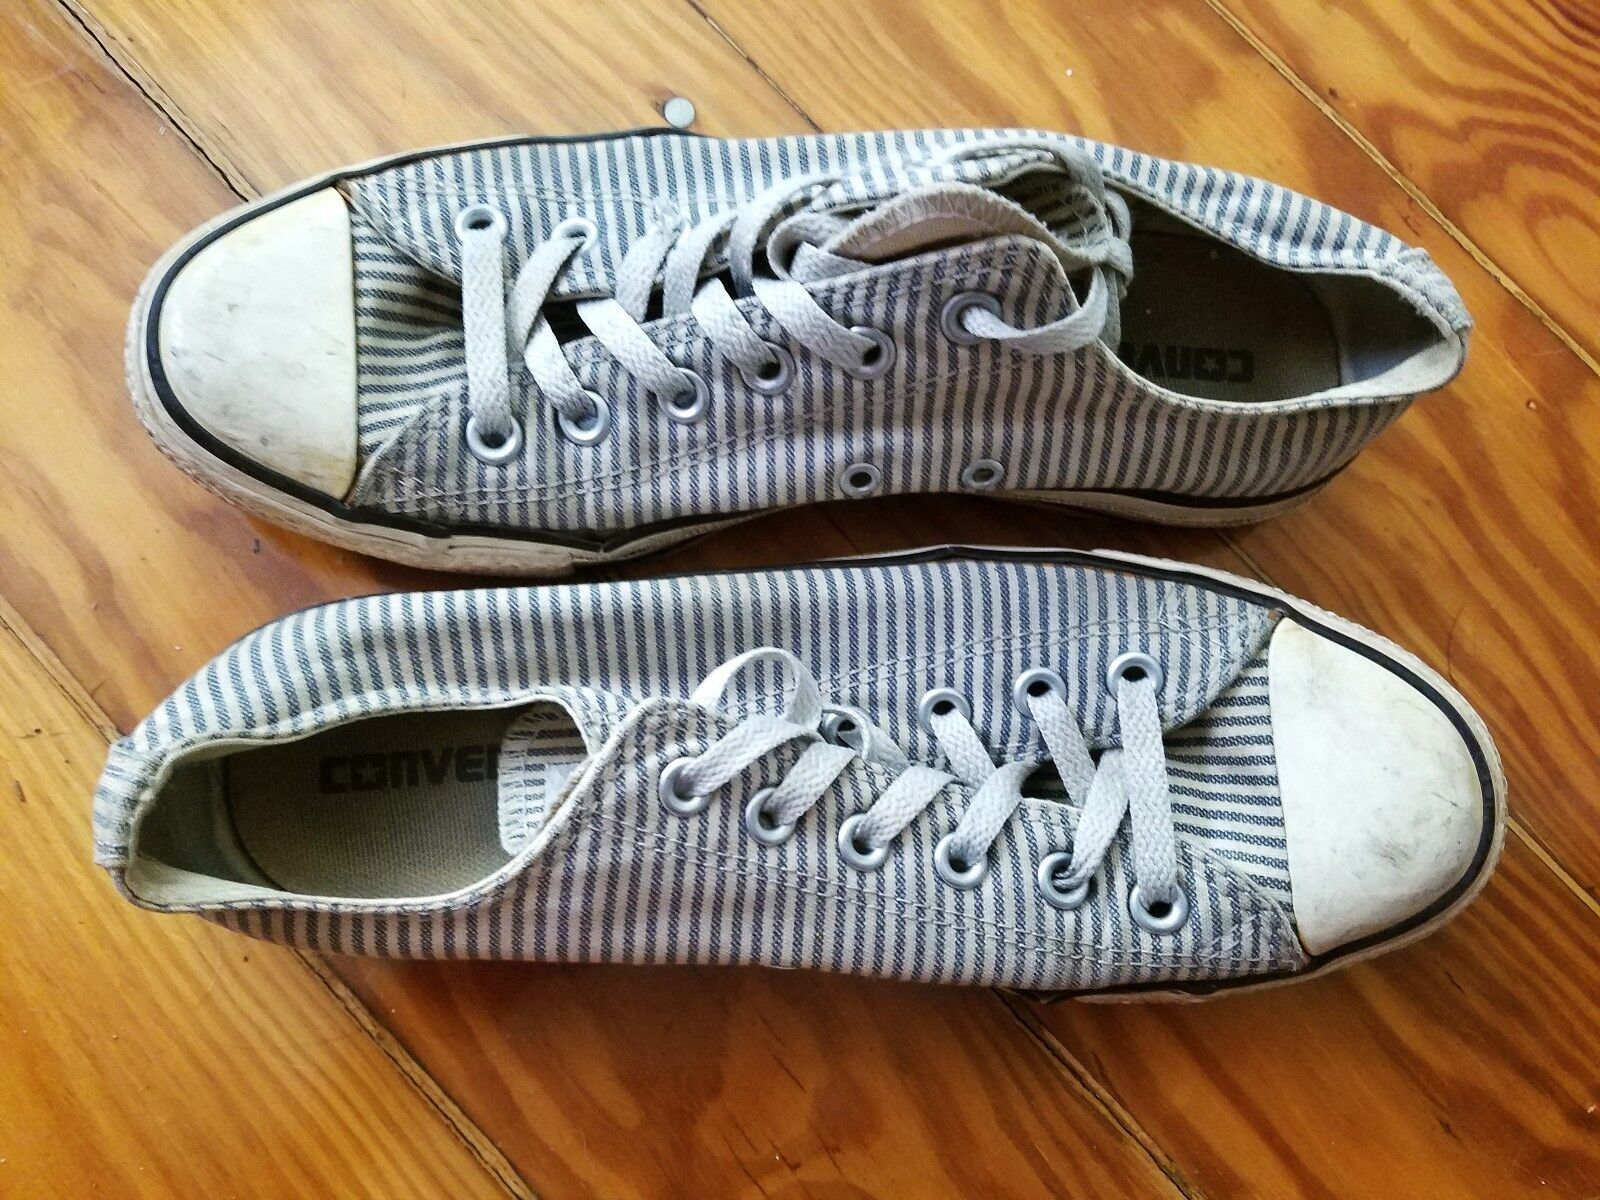 VTG Converse All Star Denim Blue Striped Canvas Low Top Shoes Women 9.5 Men 7.5